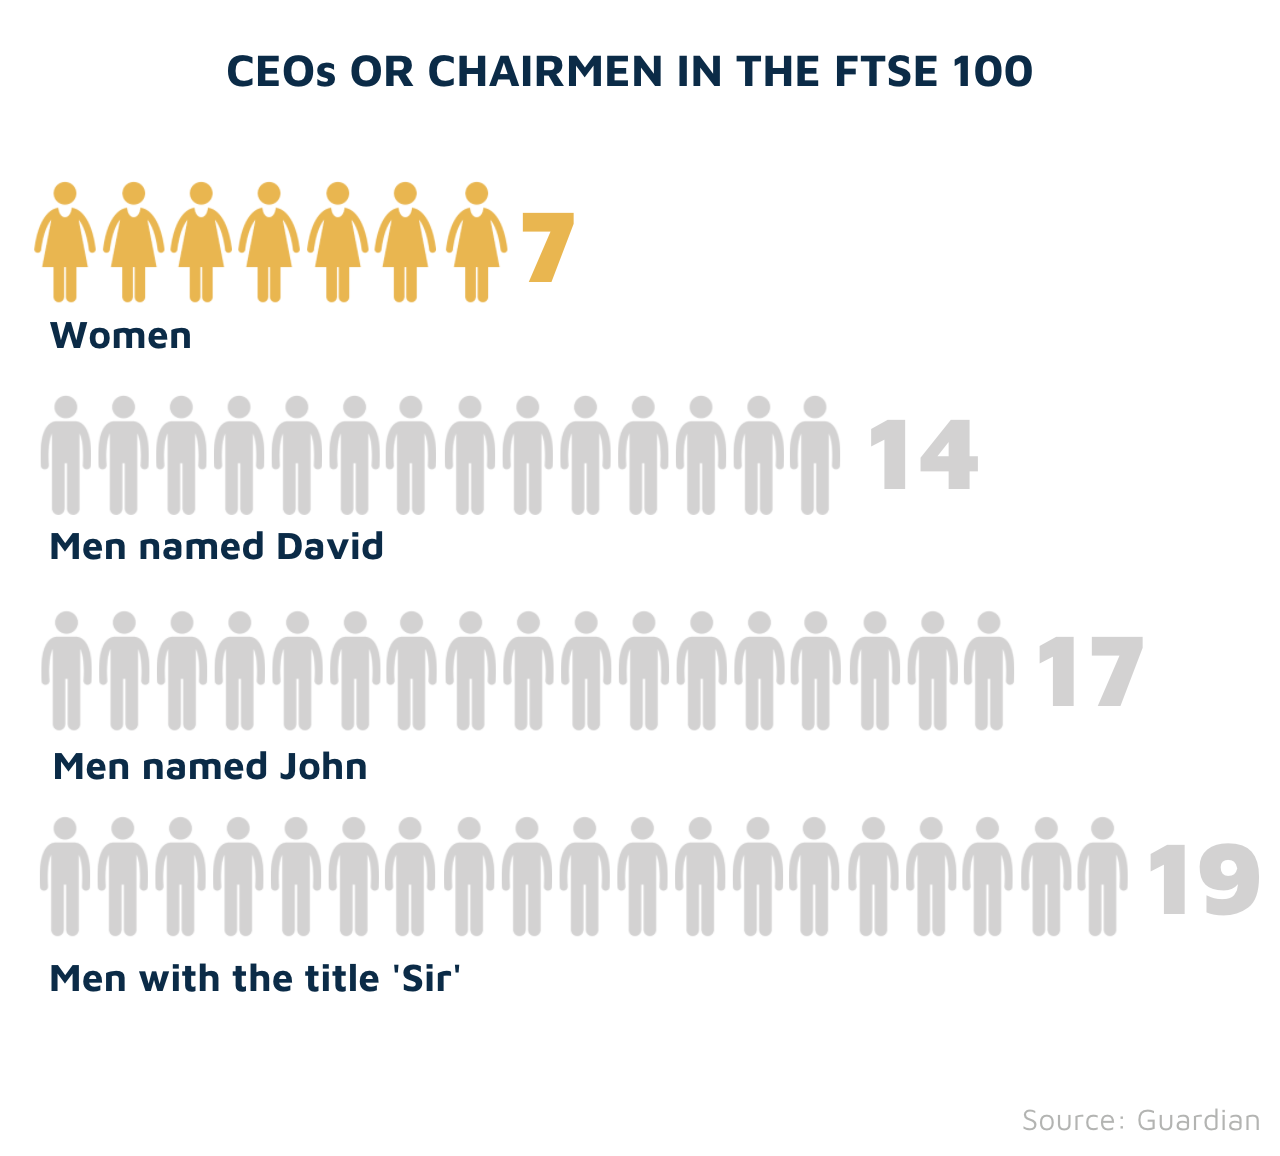 Gender diversity in the FTSE 100